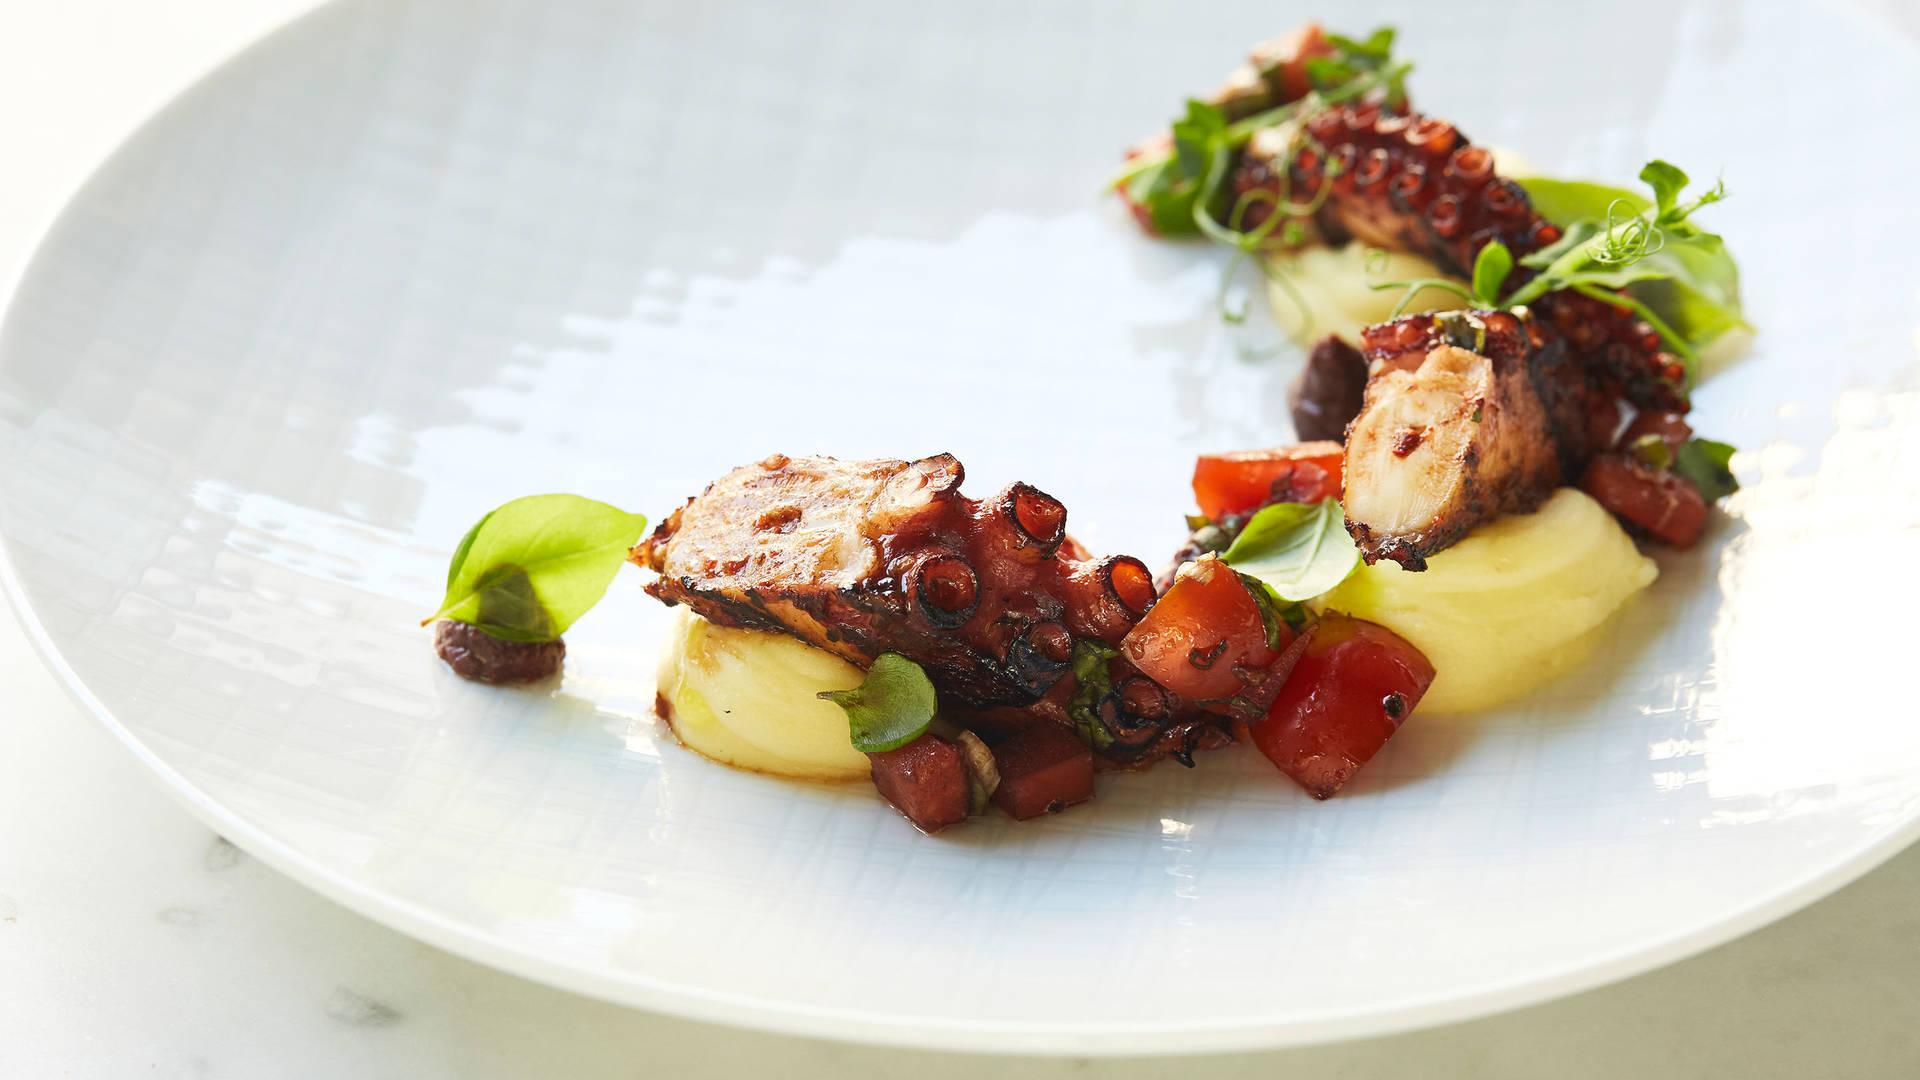 https://cdn.jumeirah.com/-/mediadh/DH/Hospitality/Jumeirah/Article/Stories/Wanderlust/Experience-Tuscany-via-Dubai/Jumeirah-Al-Naseem-Rockfish-Grilled-Octopus_16-9.jpg?h=1080&w=1920&hash=DFB7DBCA8D3785231514B0594707B787